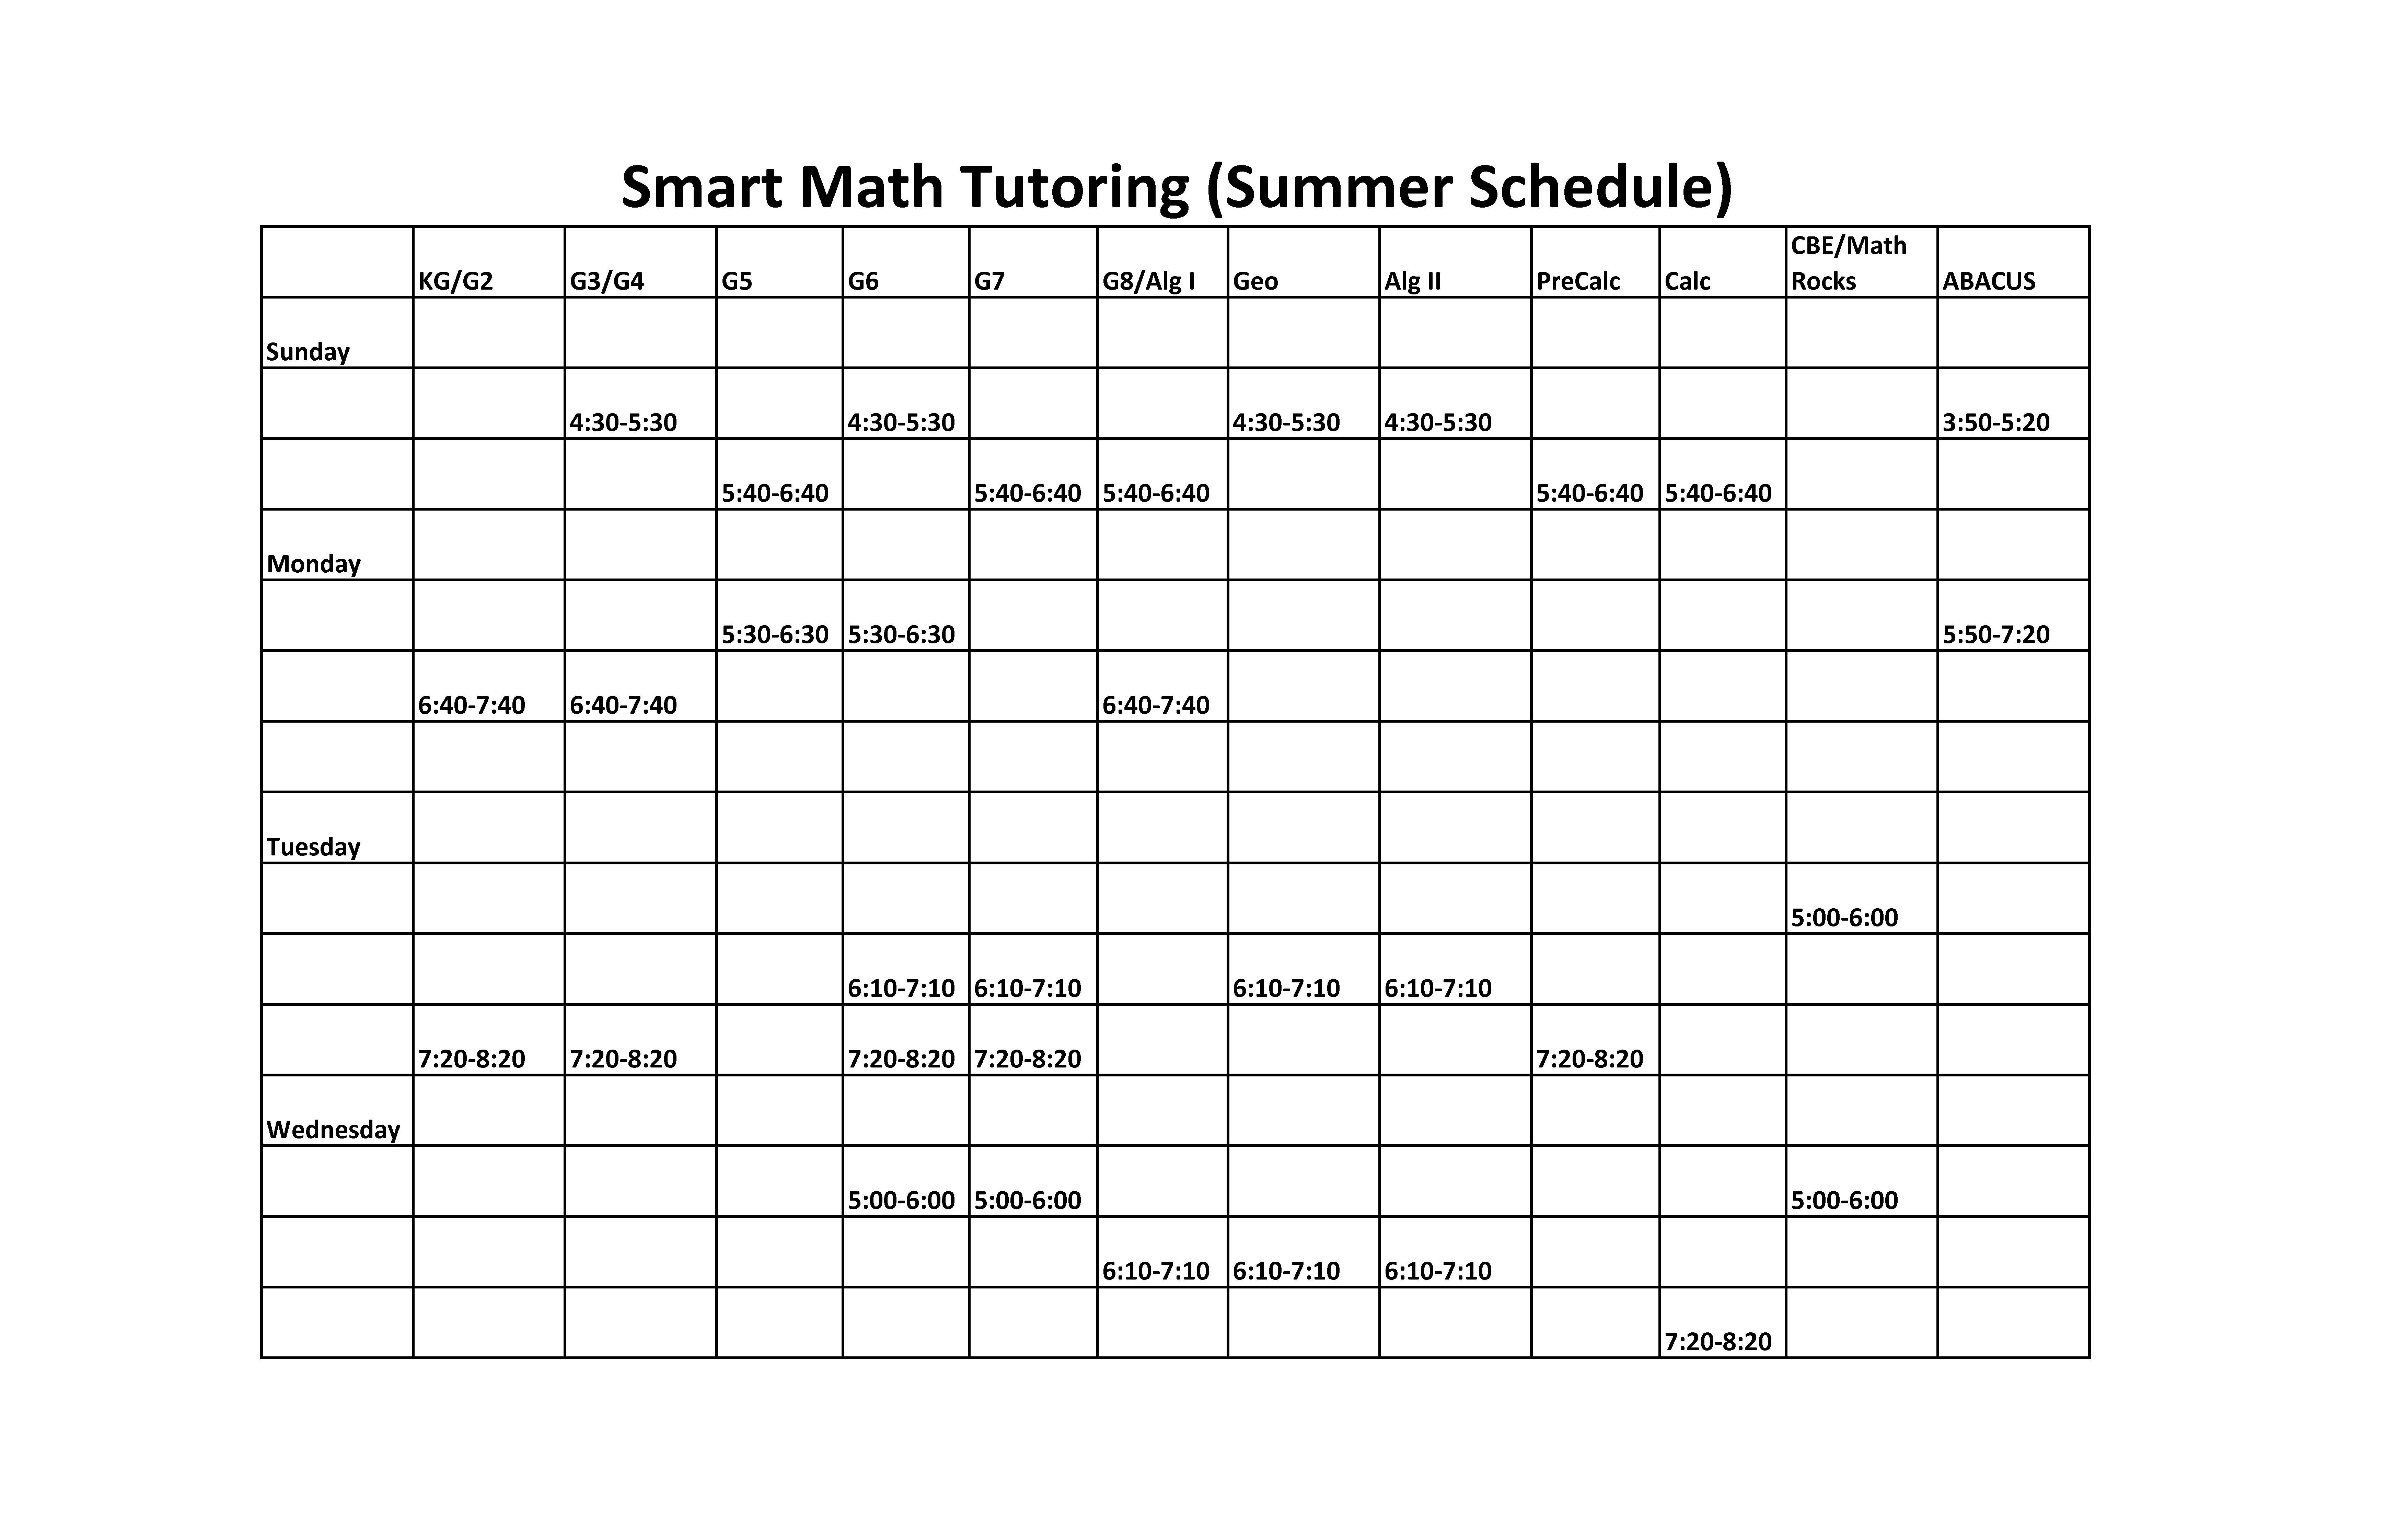 Smart Math Tutoring - Summer Schedule